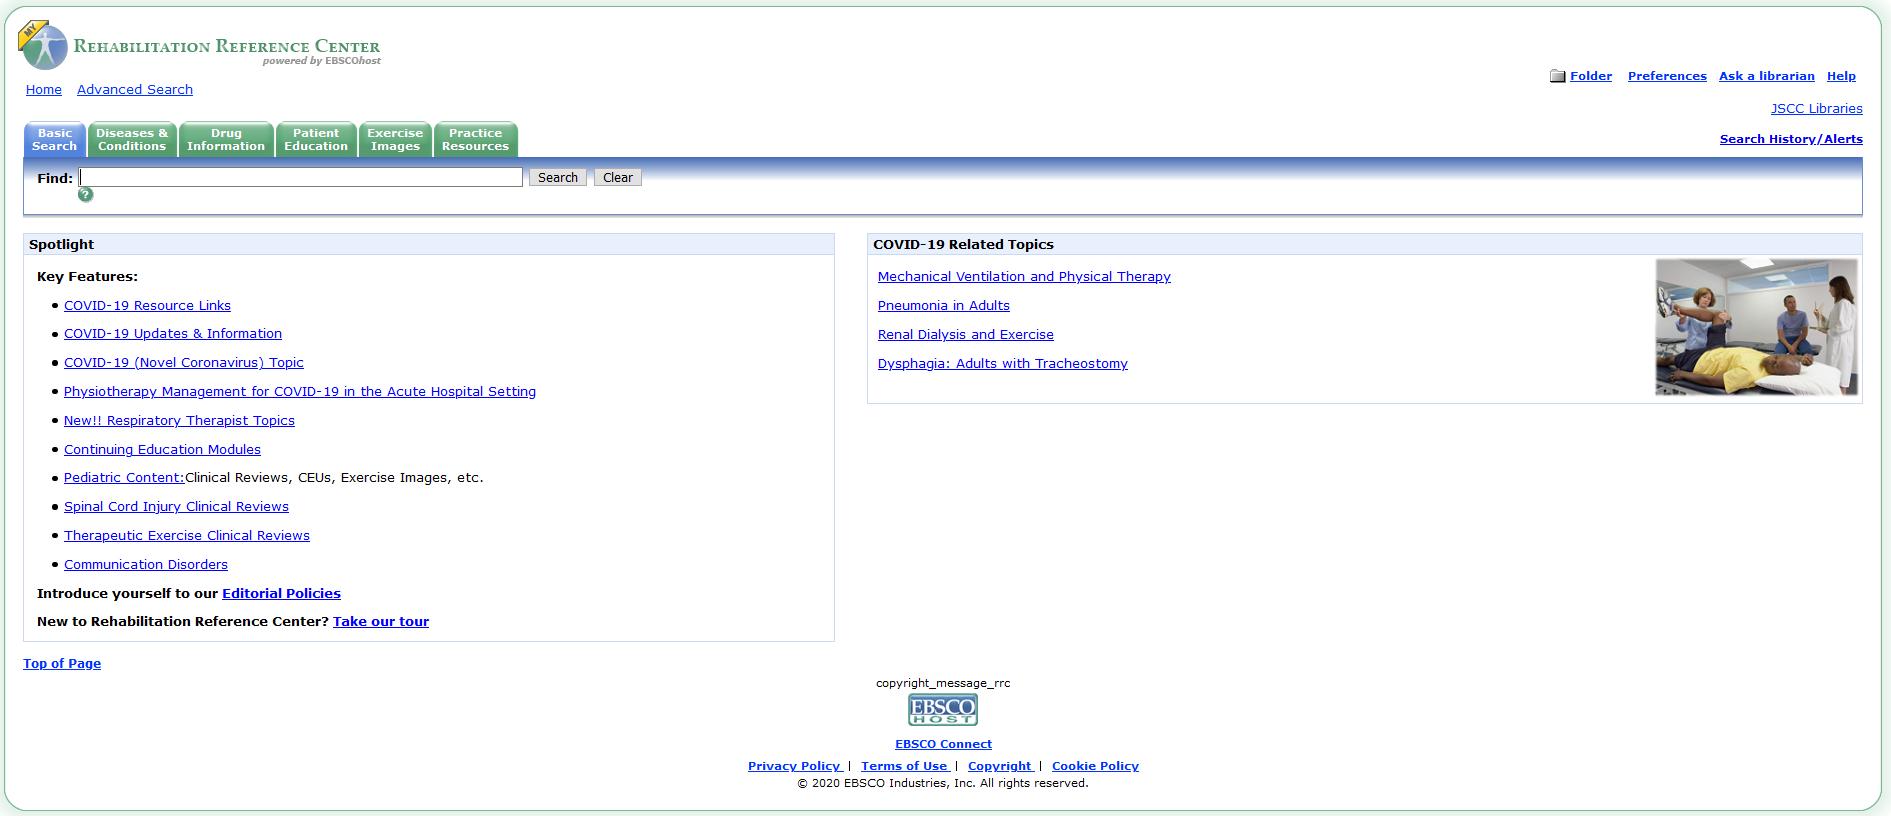 RRC Home Page Image